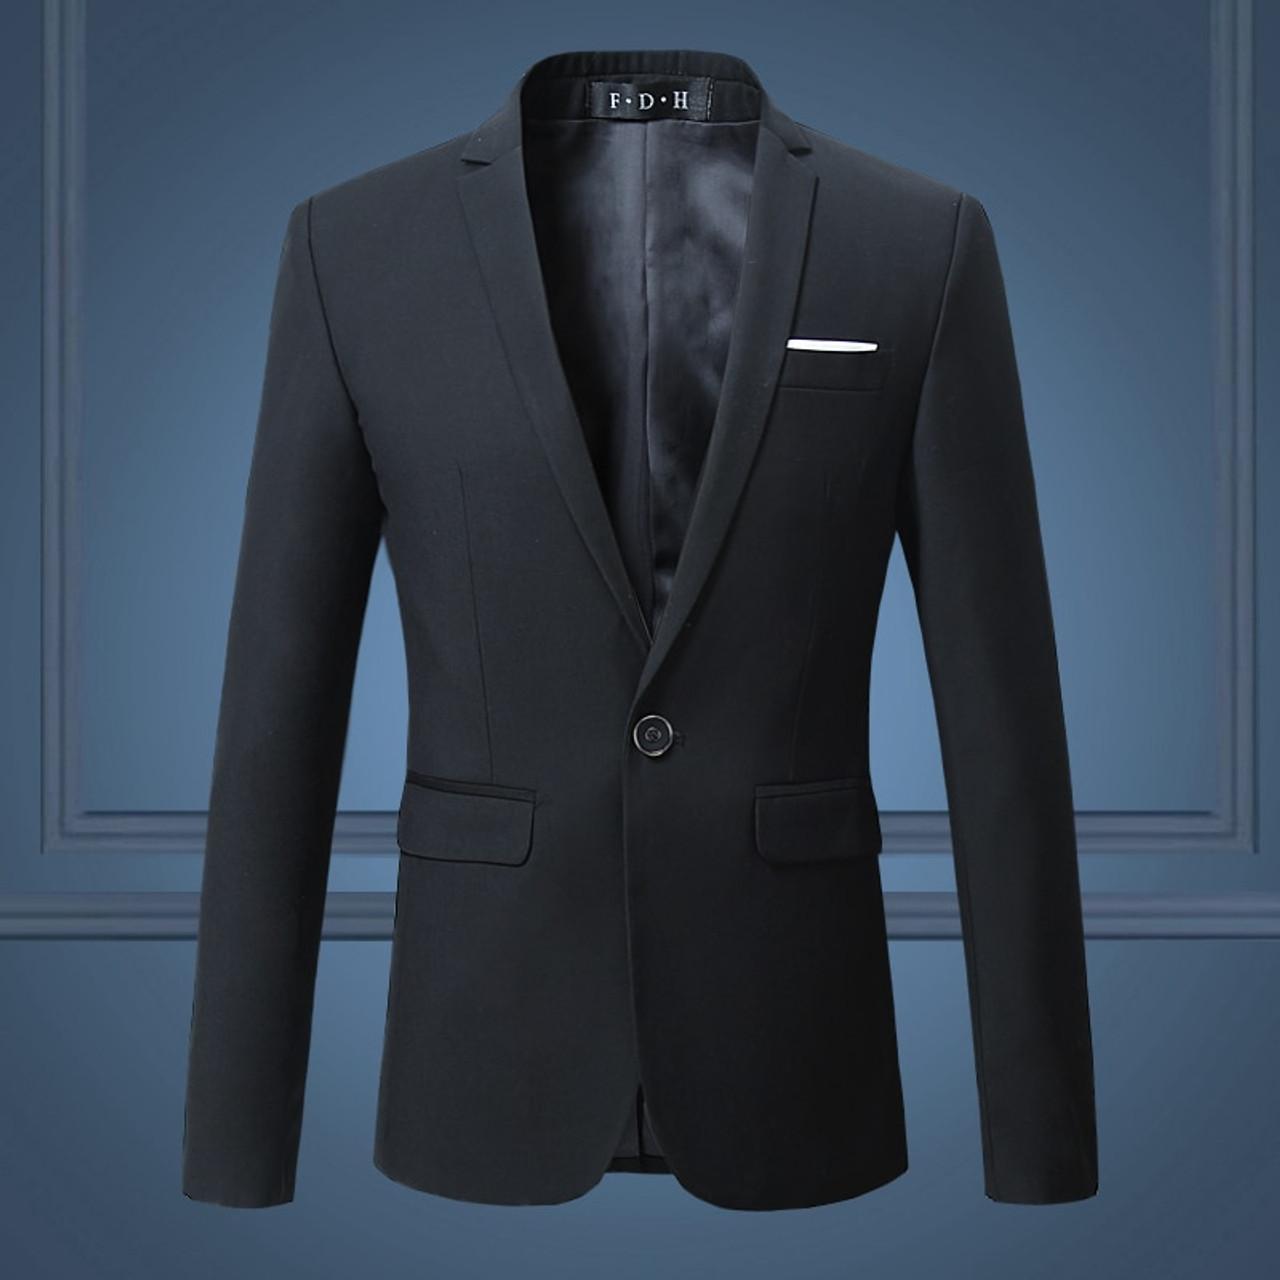 Black Classy Men S Blazer Jacket One Button Slim Wedding Suit Men Solid M 3xl Mens Casual Blazers White Customizable Big Size Onshopdeals Com,David Tutera Disney Wedding Dresses